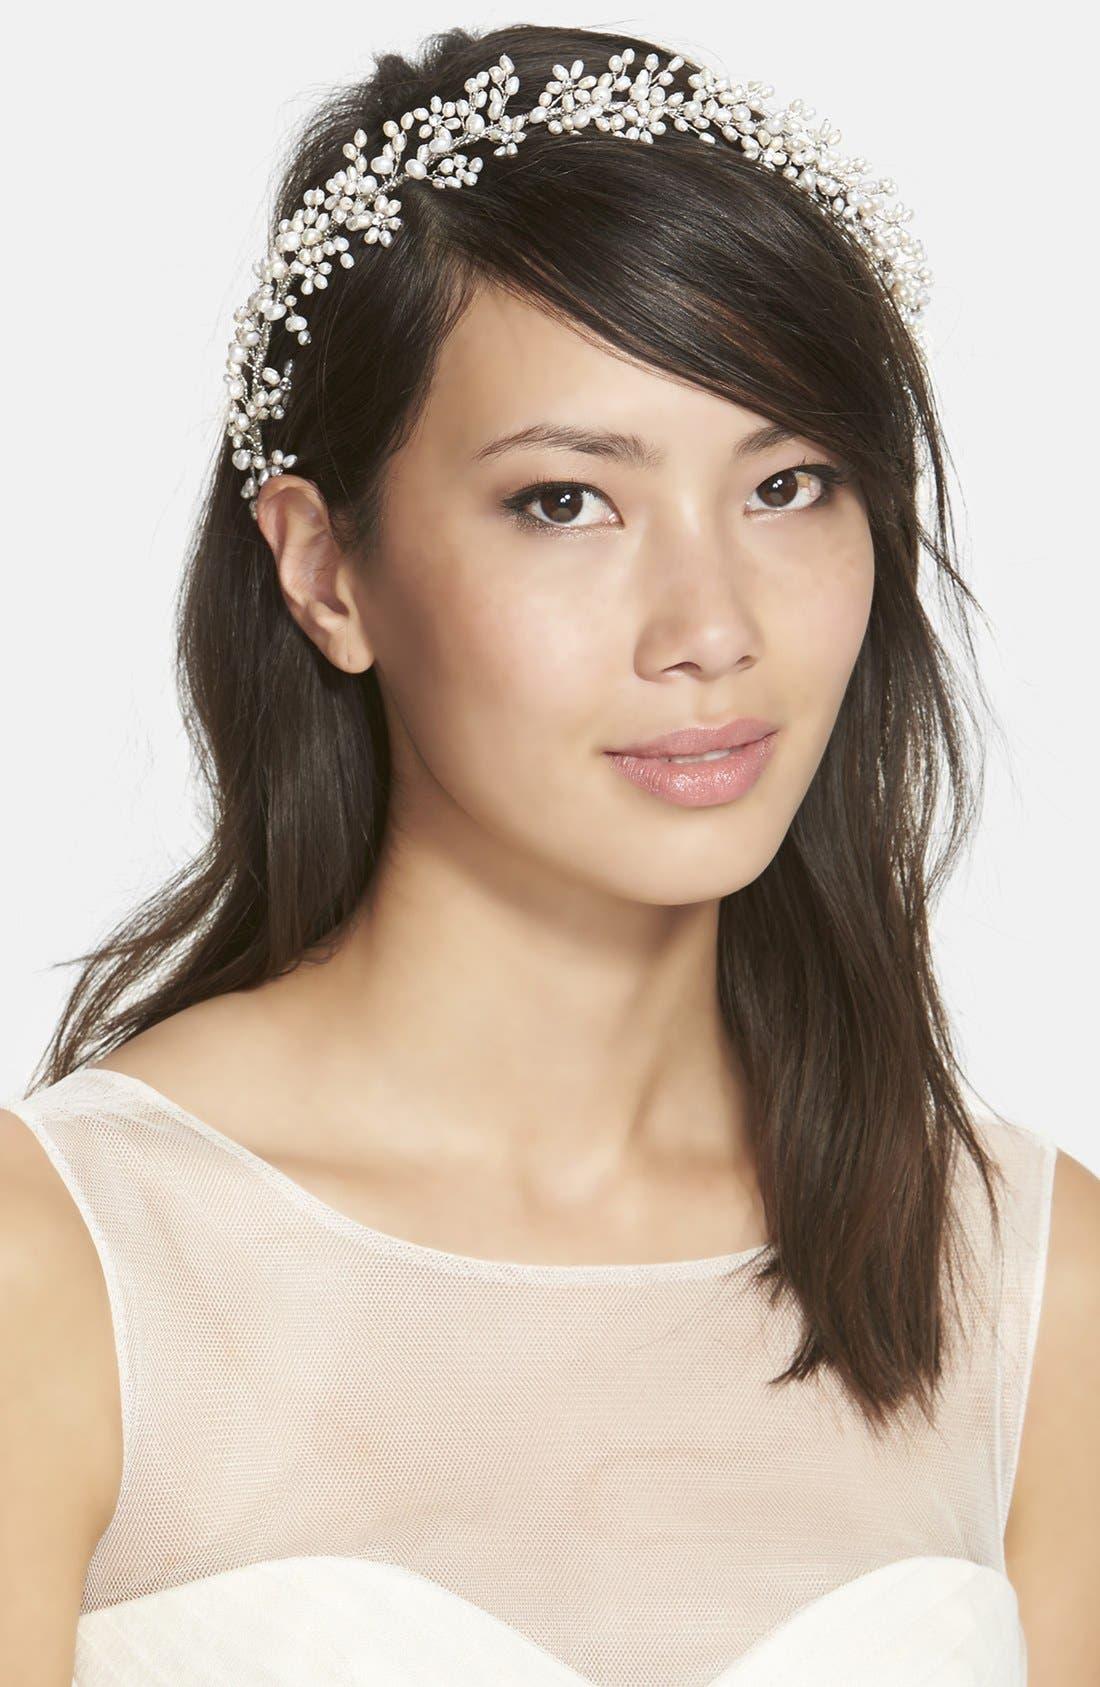 Alternate Image 1 Selected - twigs & honey 'Baby's Breath' Freshwater Pearl & Swarovski Crystal Headband